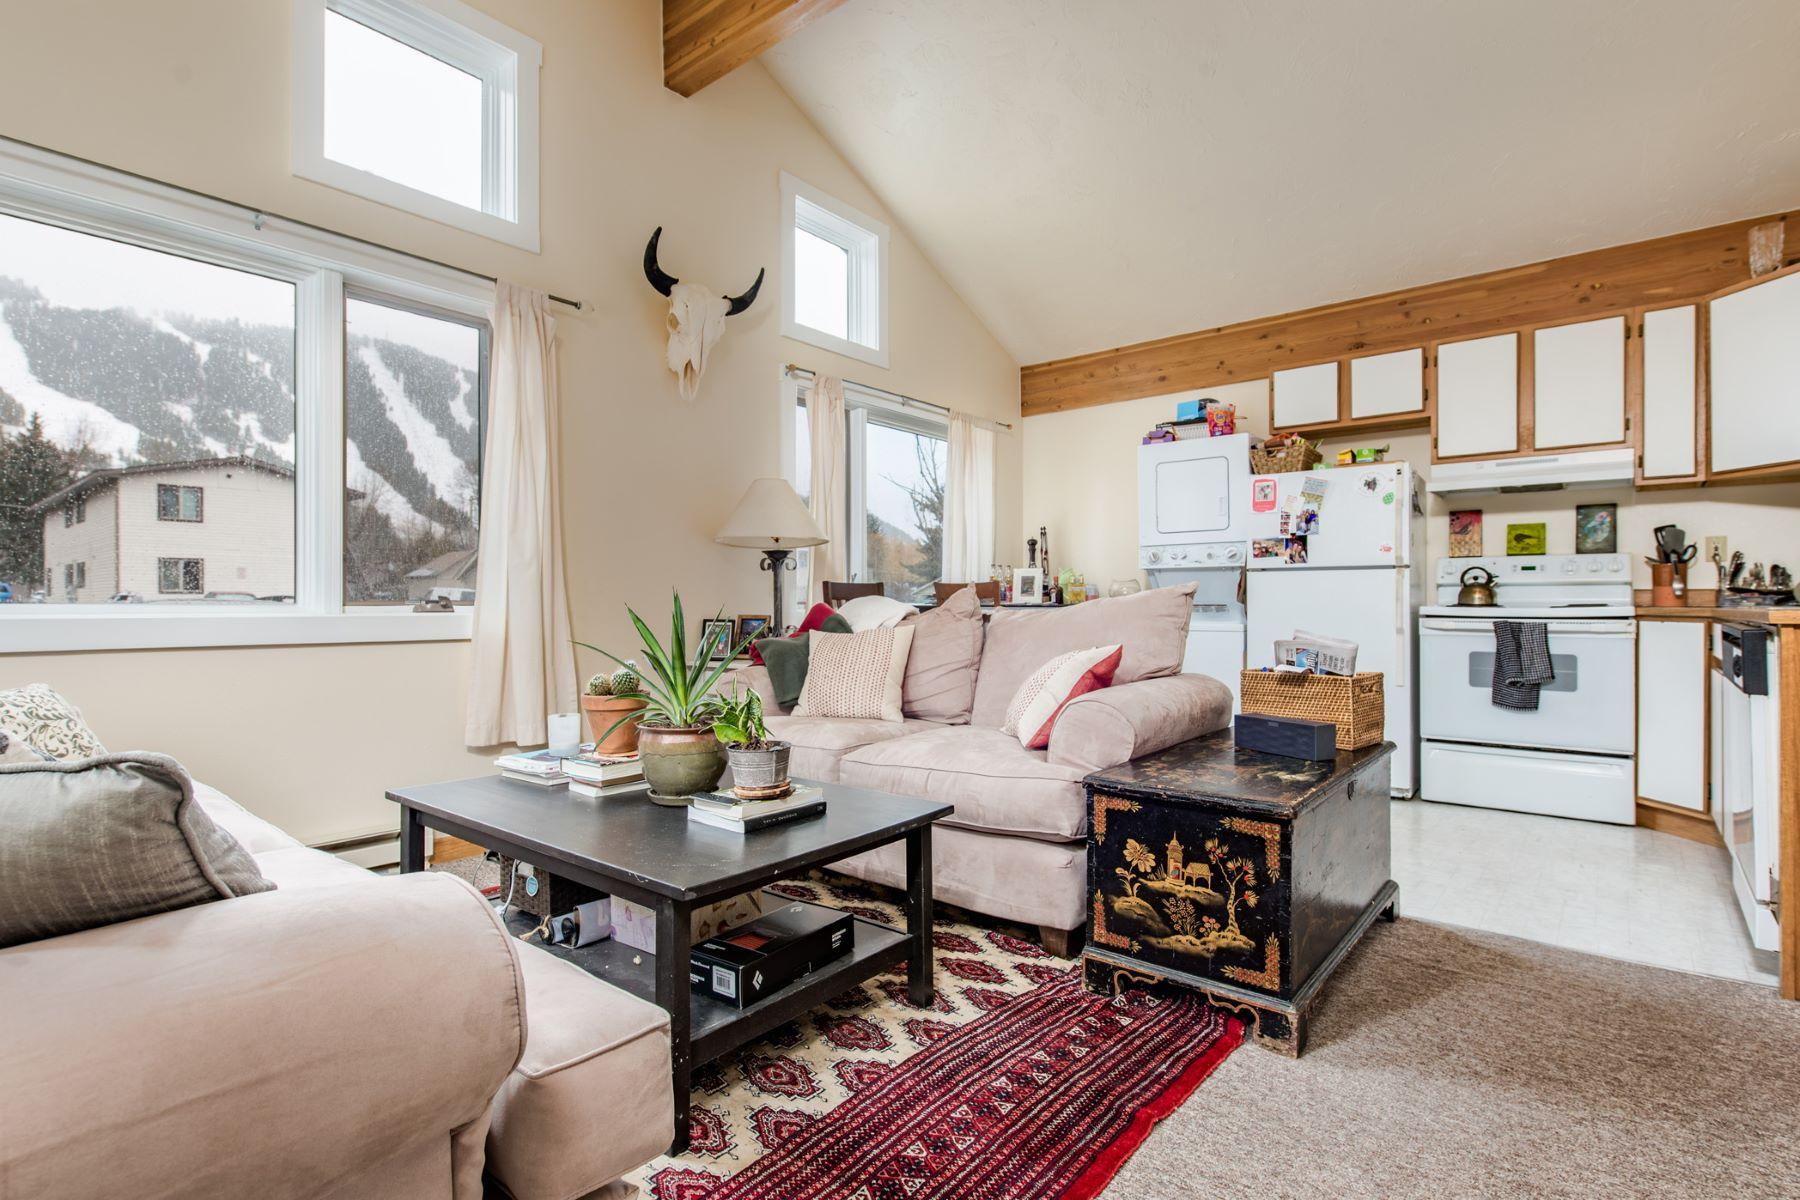 Частный односемейный дом для того Продажа на Multi-Family Town of Jackson 375 E Pearl Ave, Jackson, Вайоминг, 83001 Jackson Hole, Соединенные Штаты